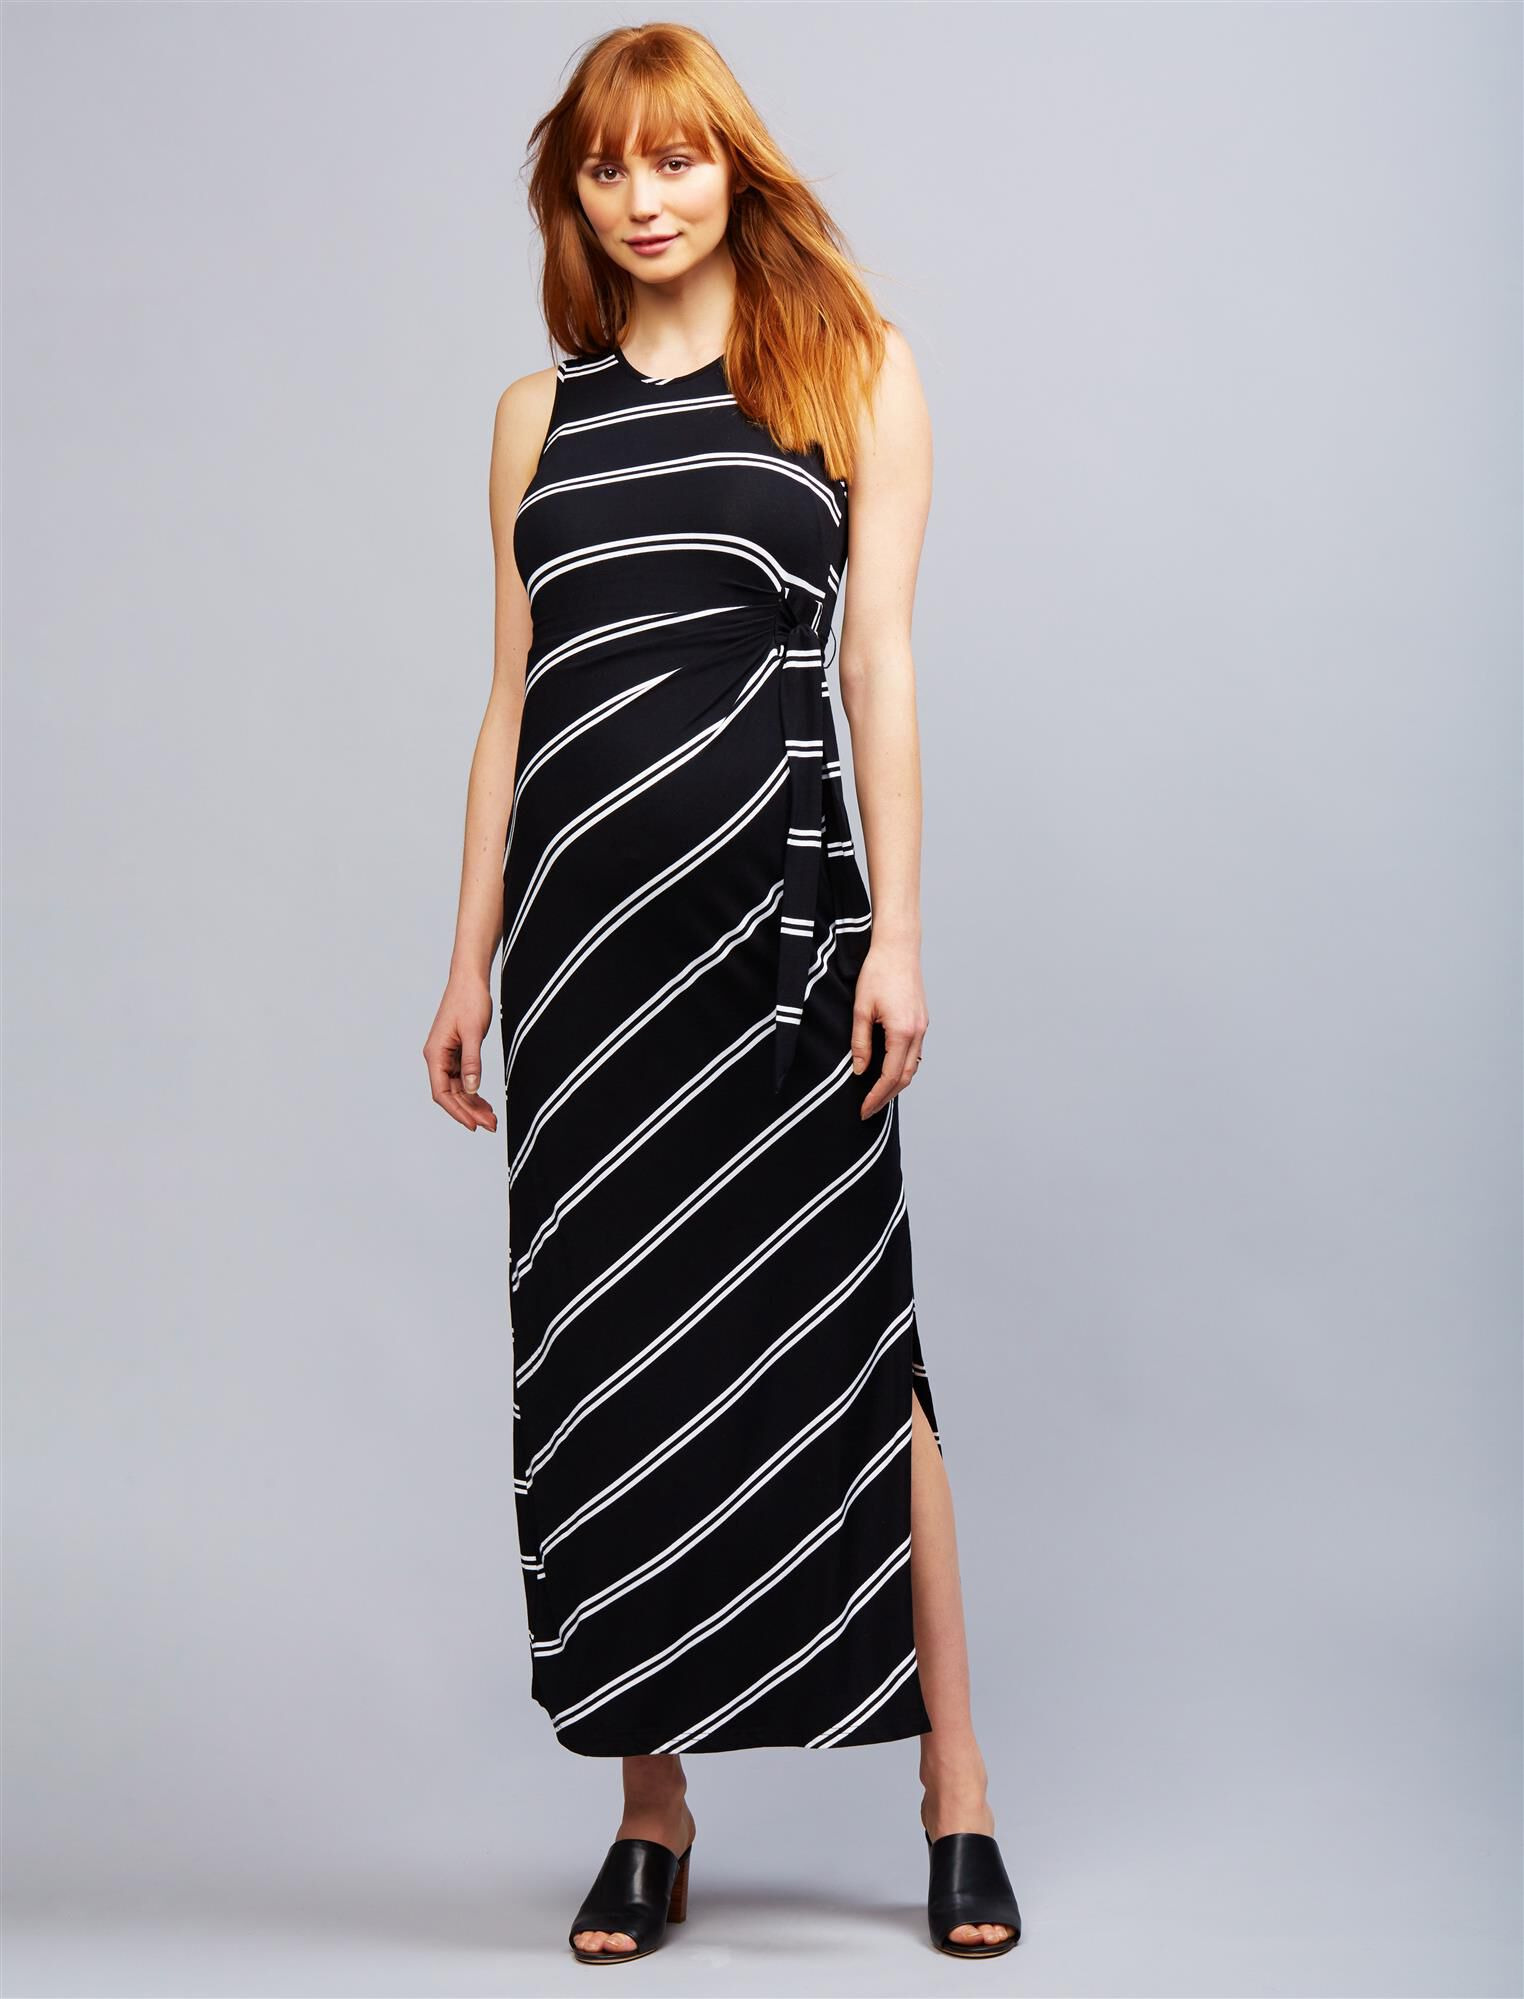 Ripe Side Tie Maternity Maxi Dress